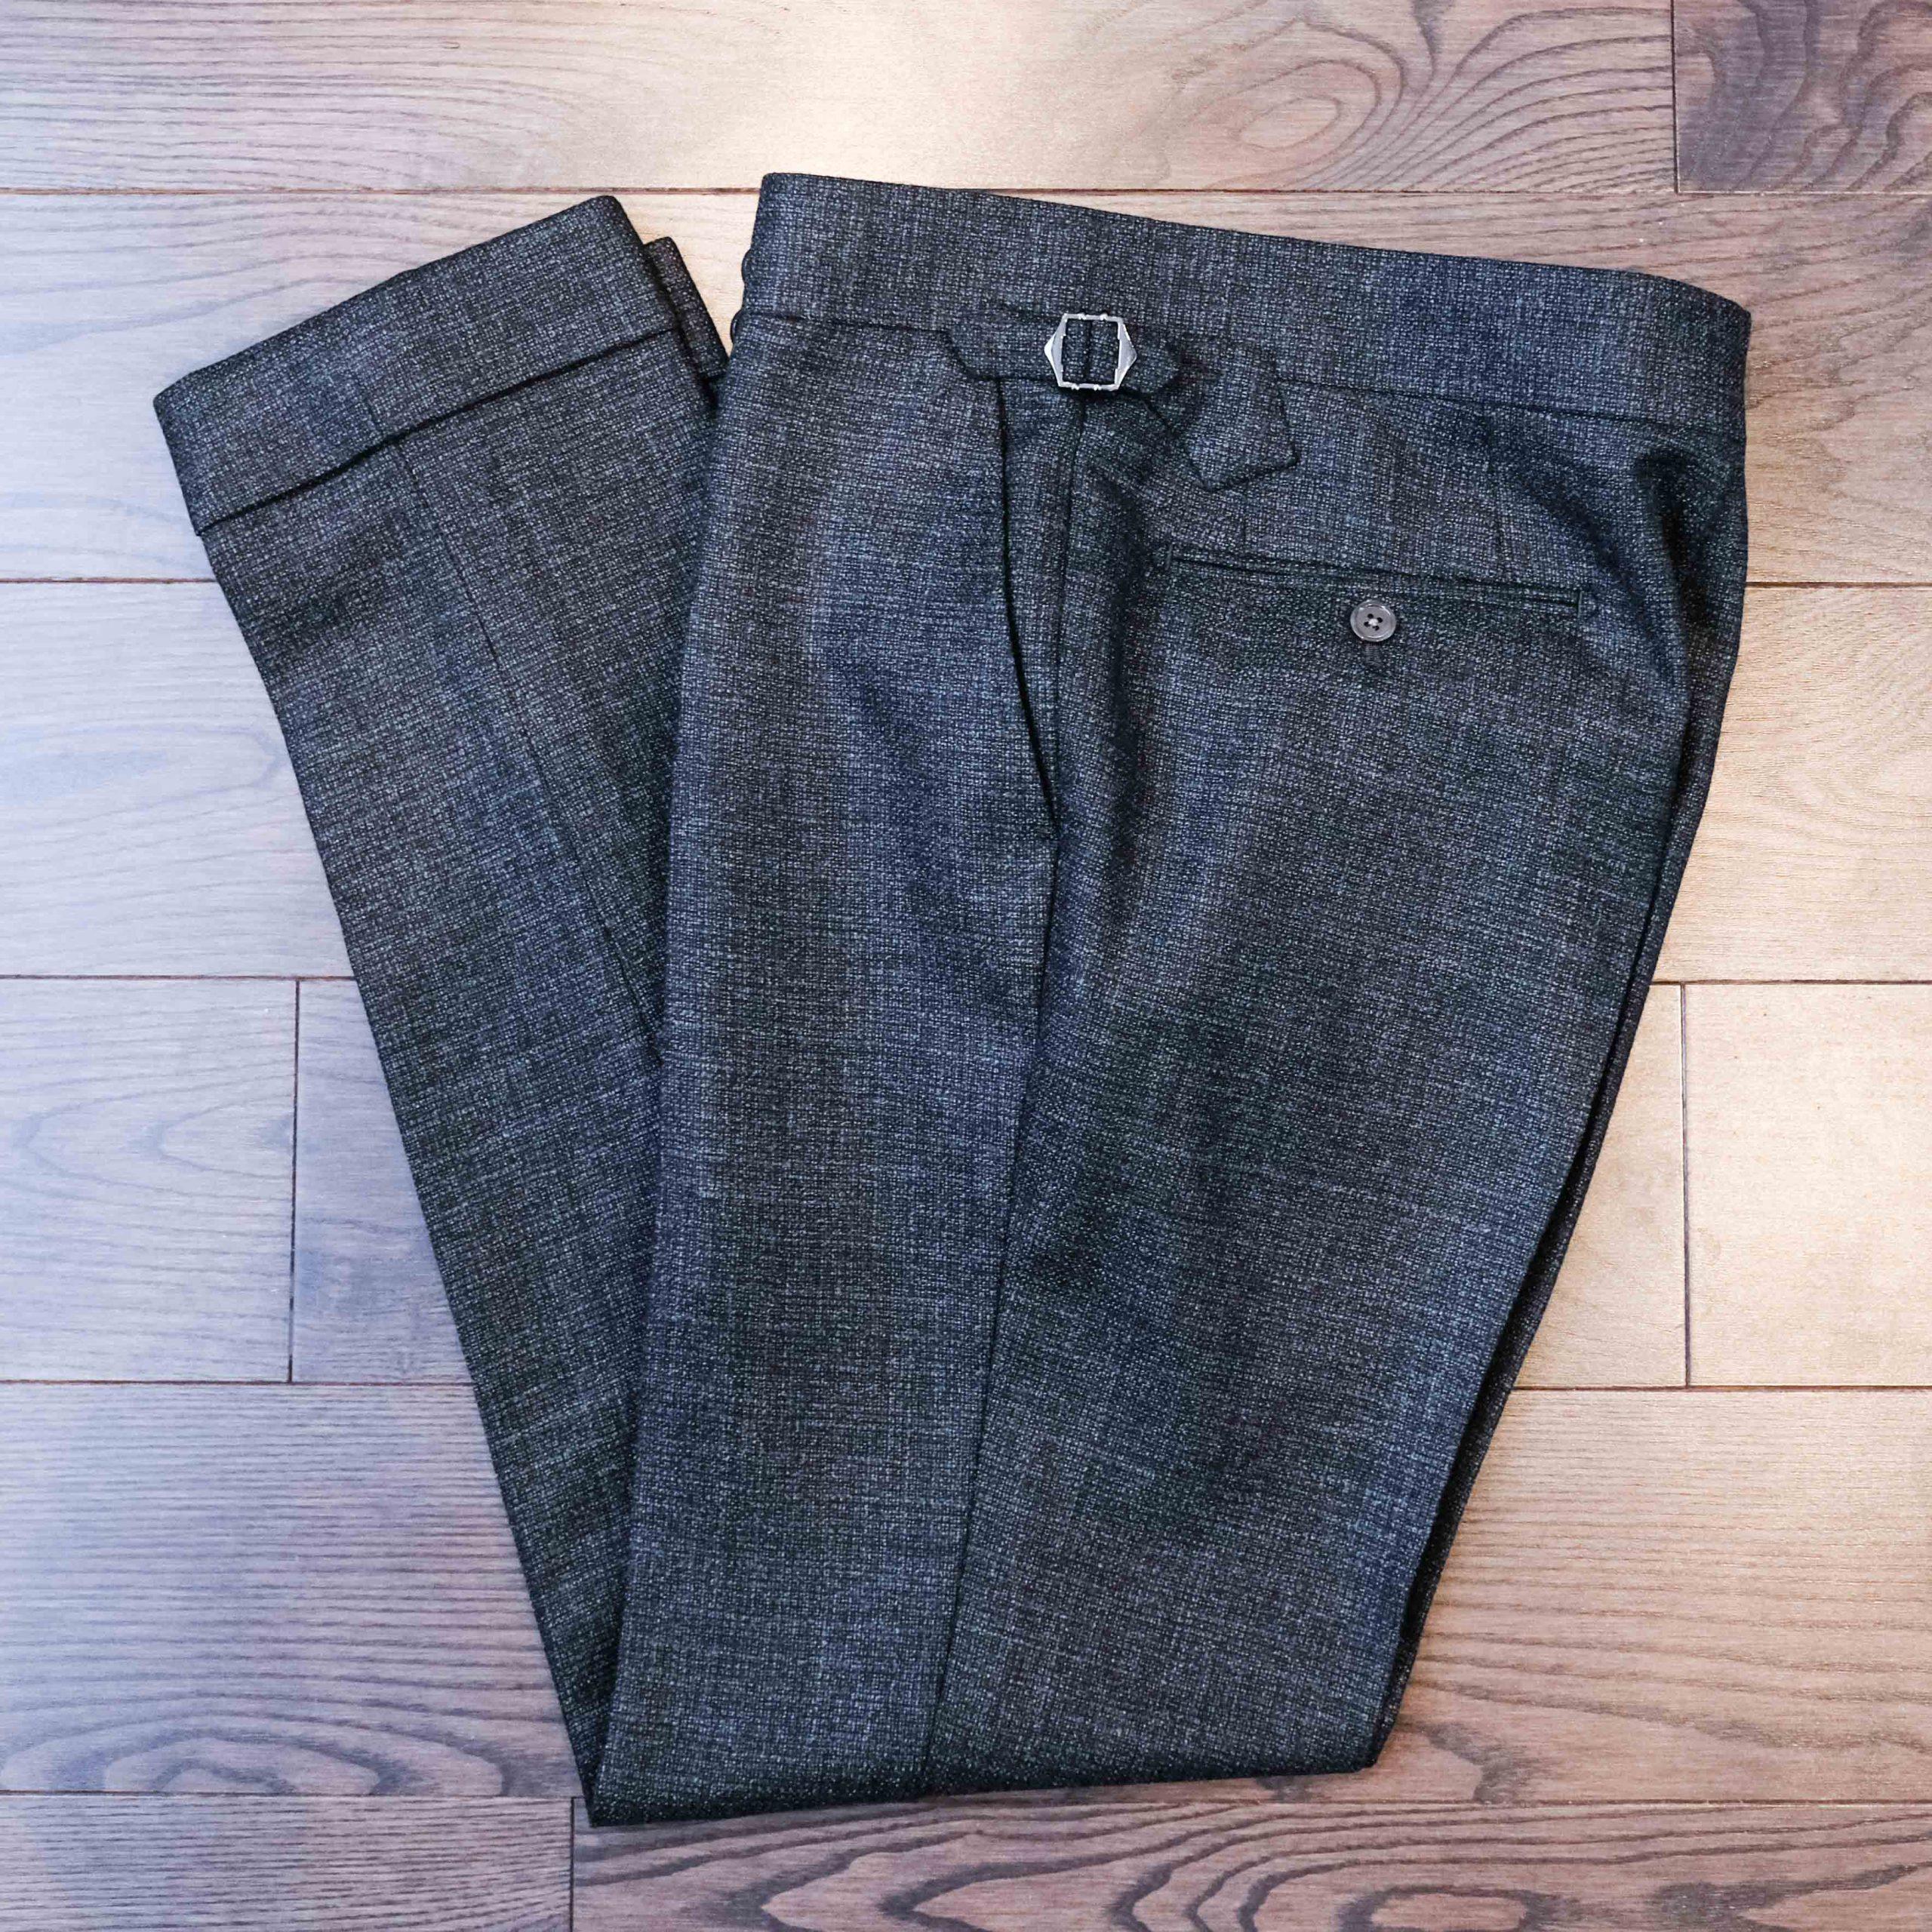 Grey Bespoke Trousers